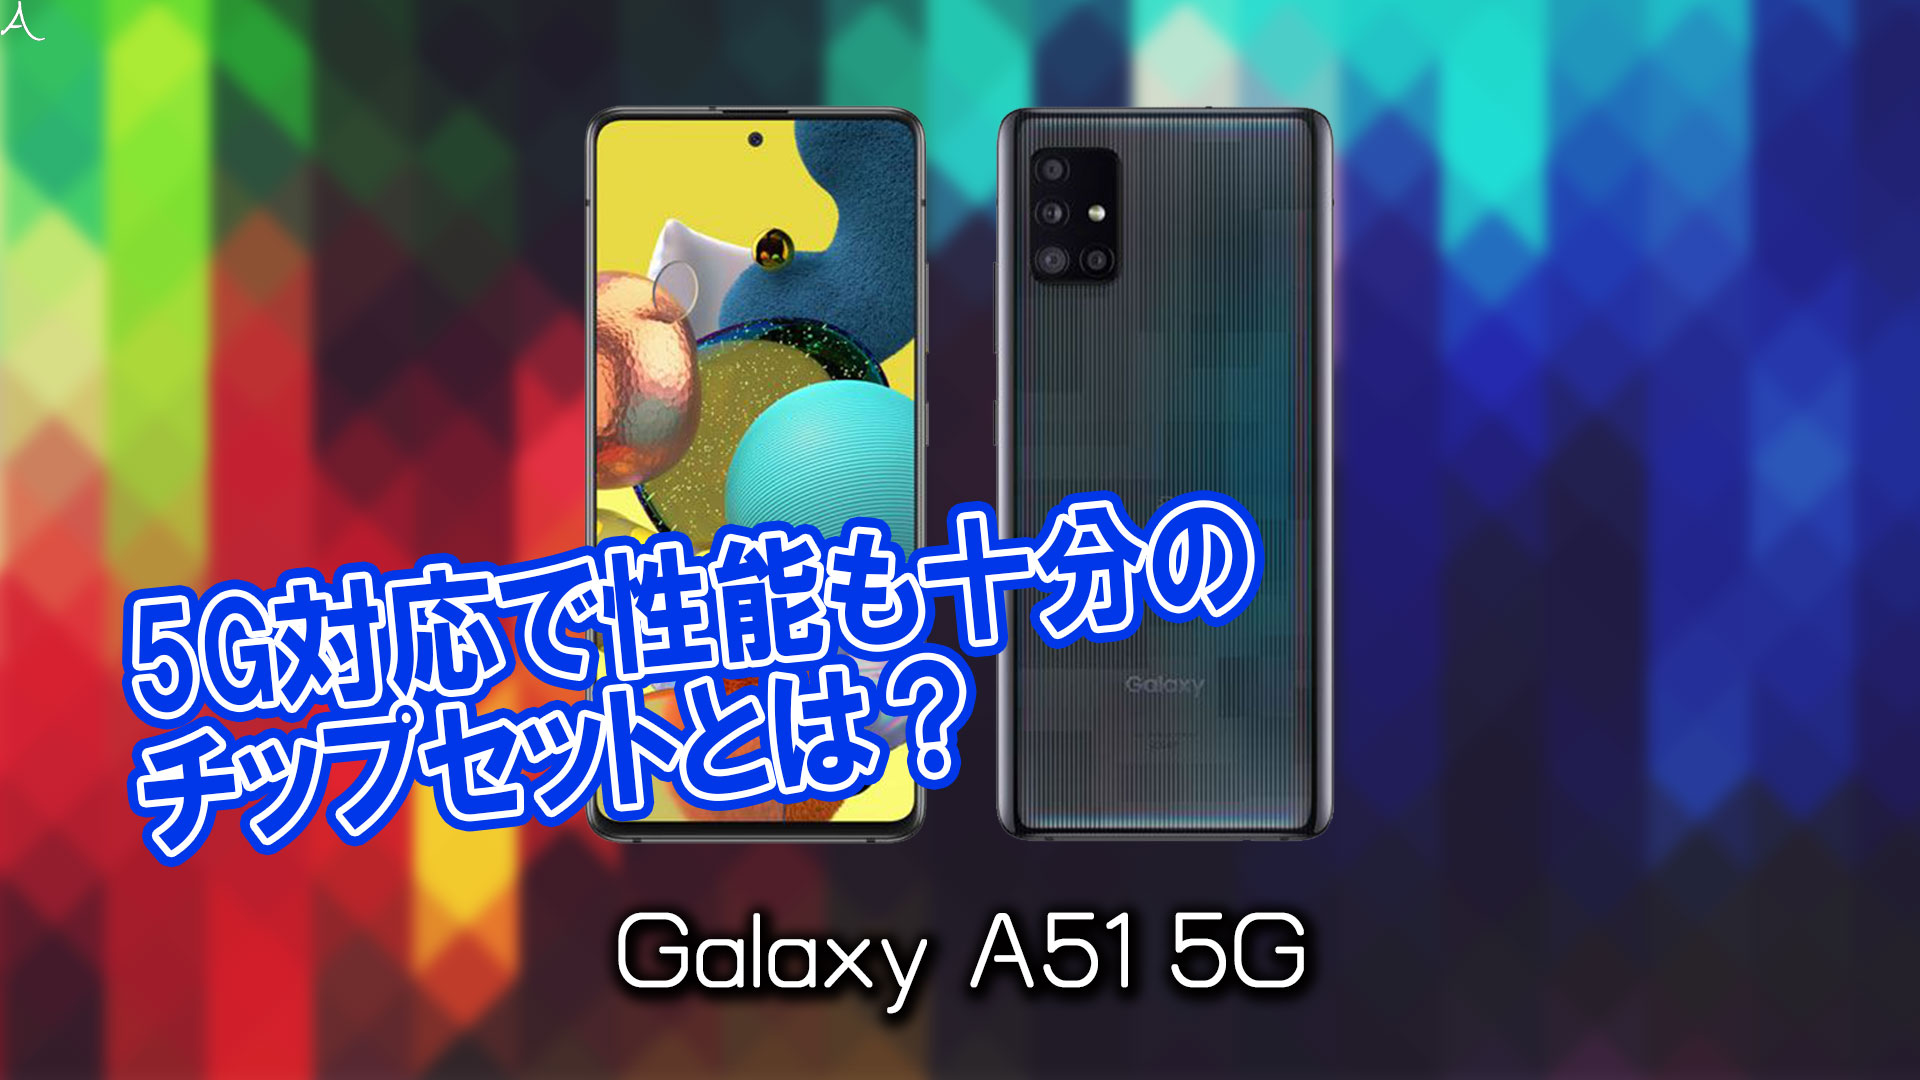 「Galaxy A51 5G」のチップセット(CPU)は何?性能をベンチマーク(Geekbench)で比較